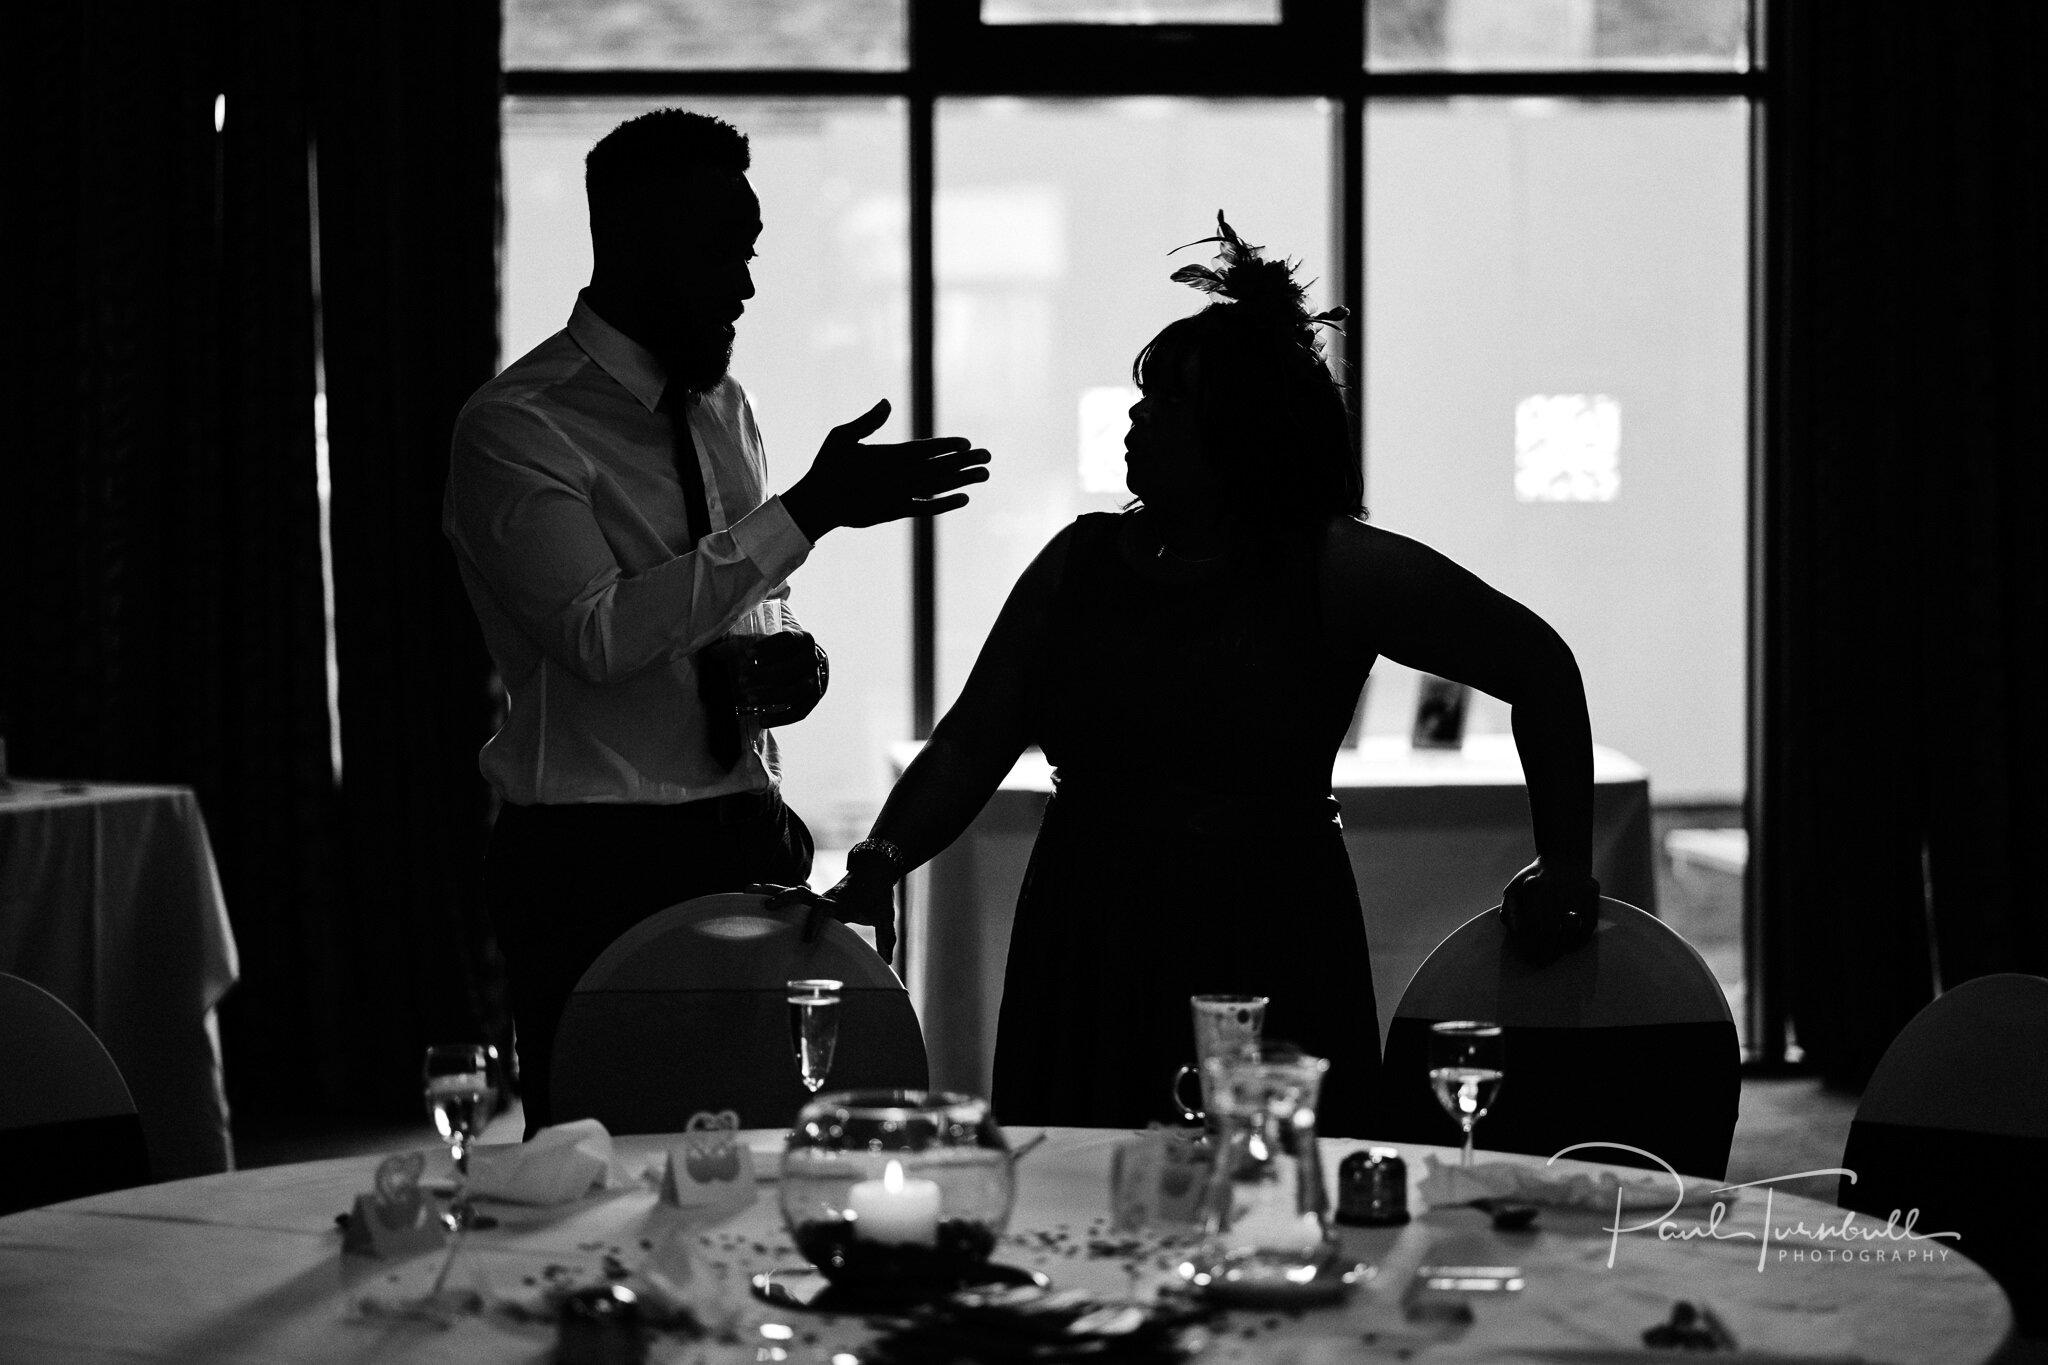 wedding-photographer-hull-yorkshire-lazaat-hotel-carlene-steve-32.jpg